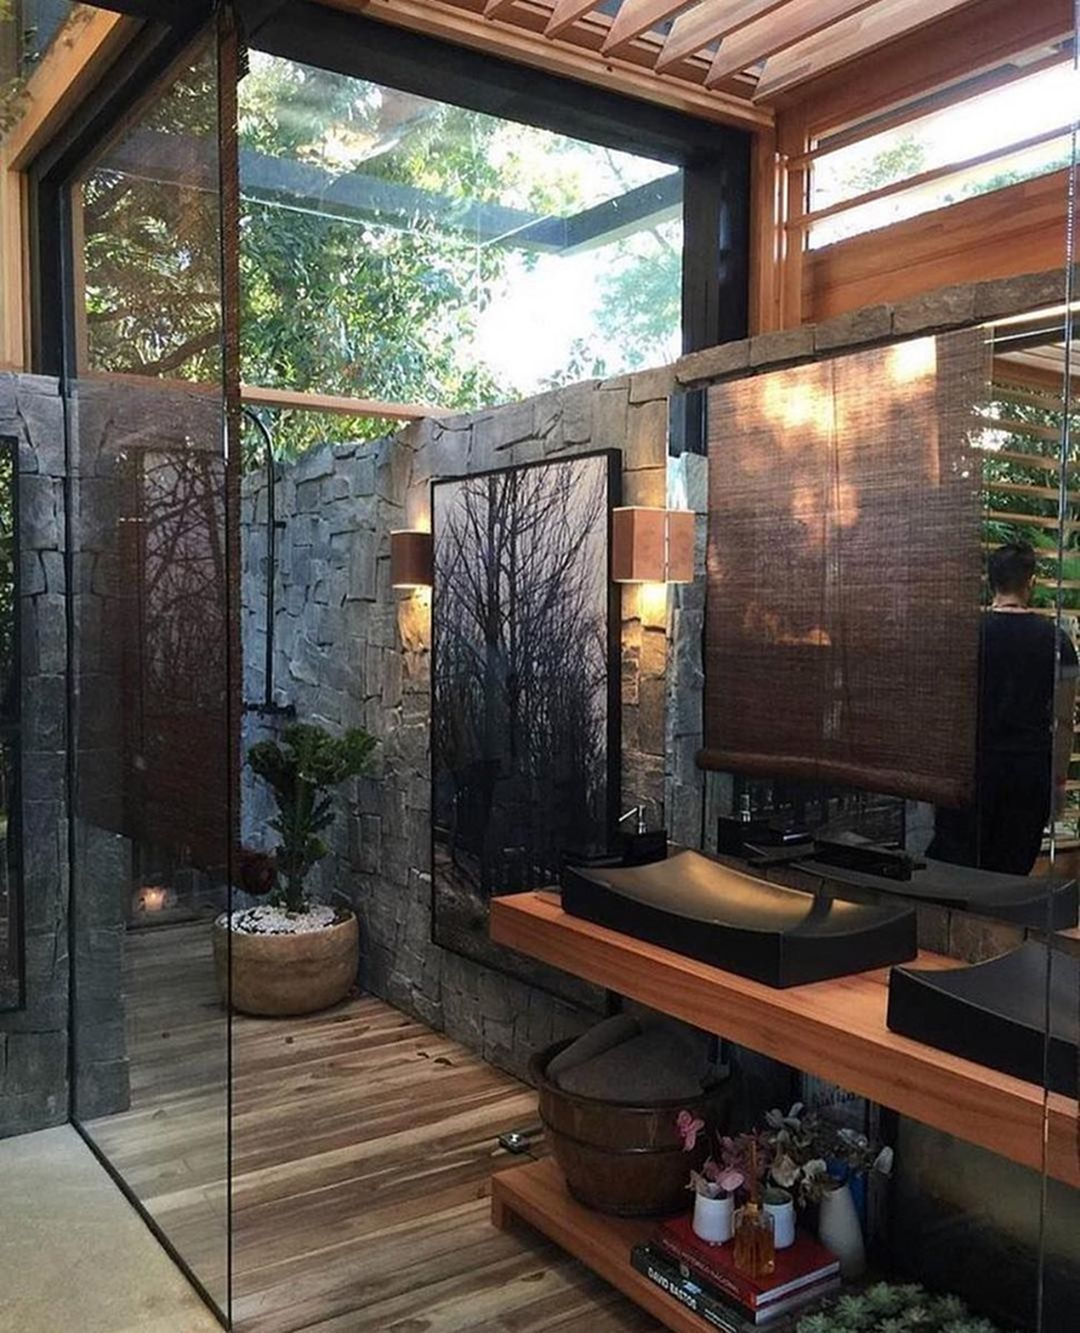 extraordinary concrete bathroom ideas | 33 Extraordinary Outdoor Bathroom Designs For Relax and ...